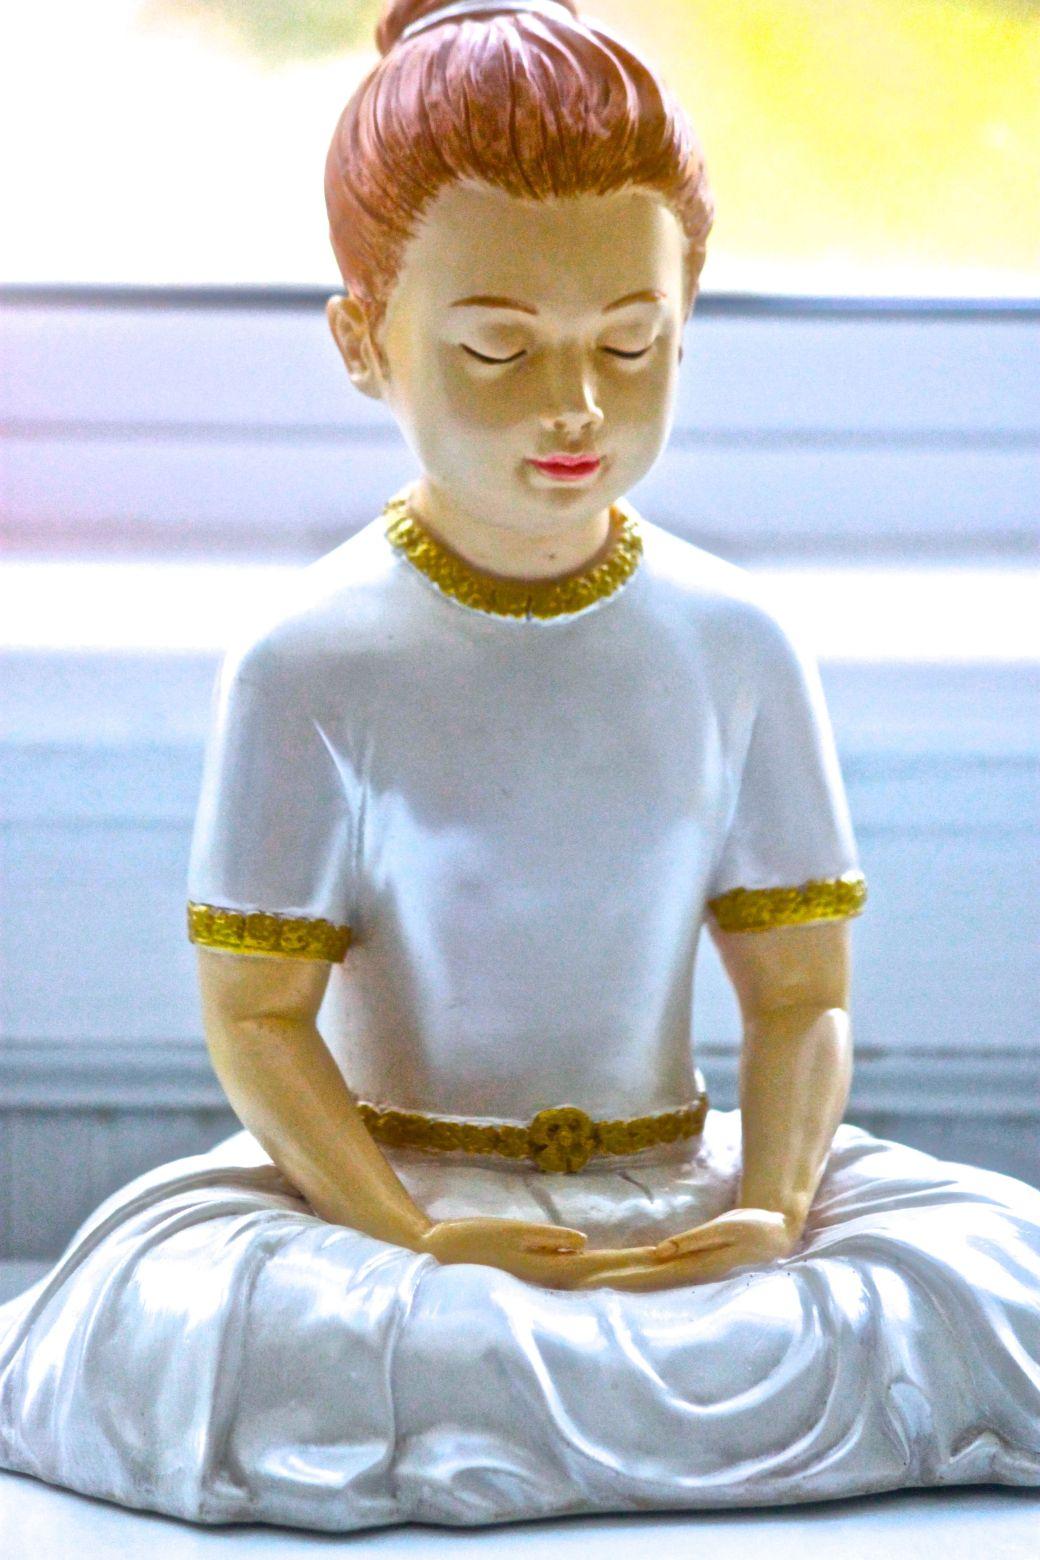 boston dhammakaya meditation center boston 2